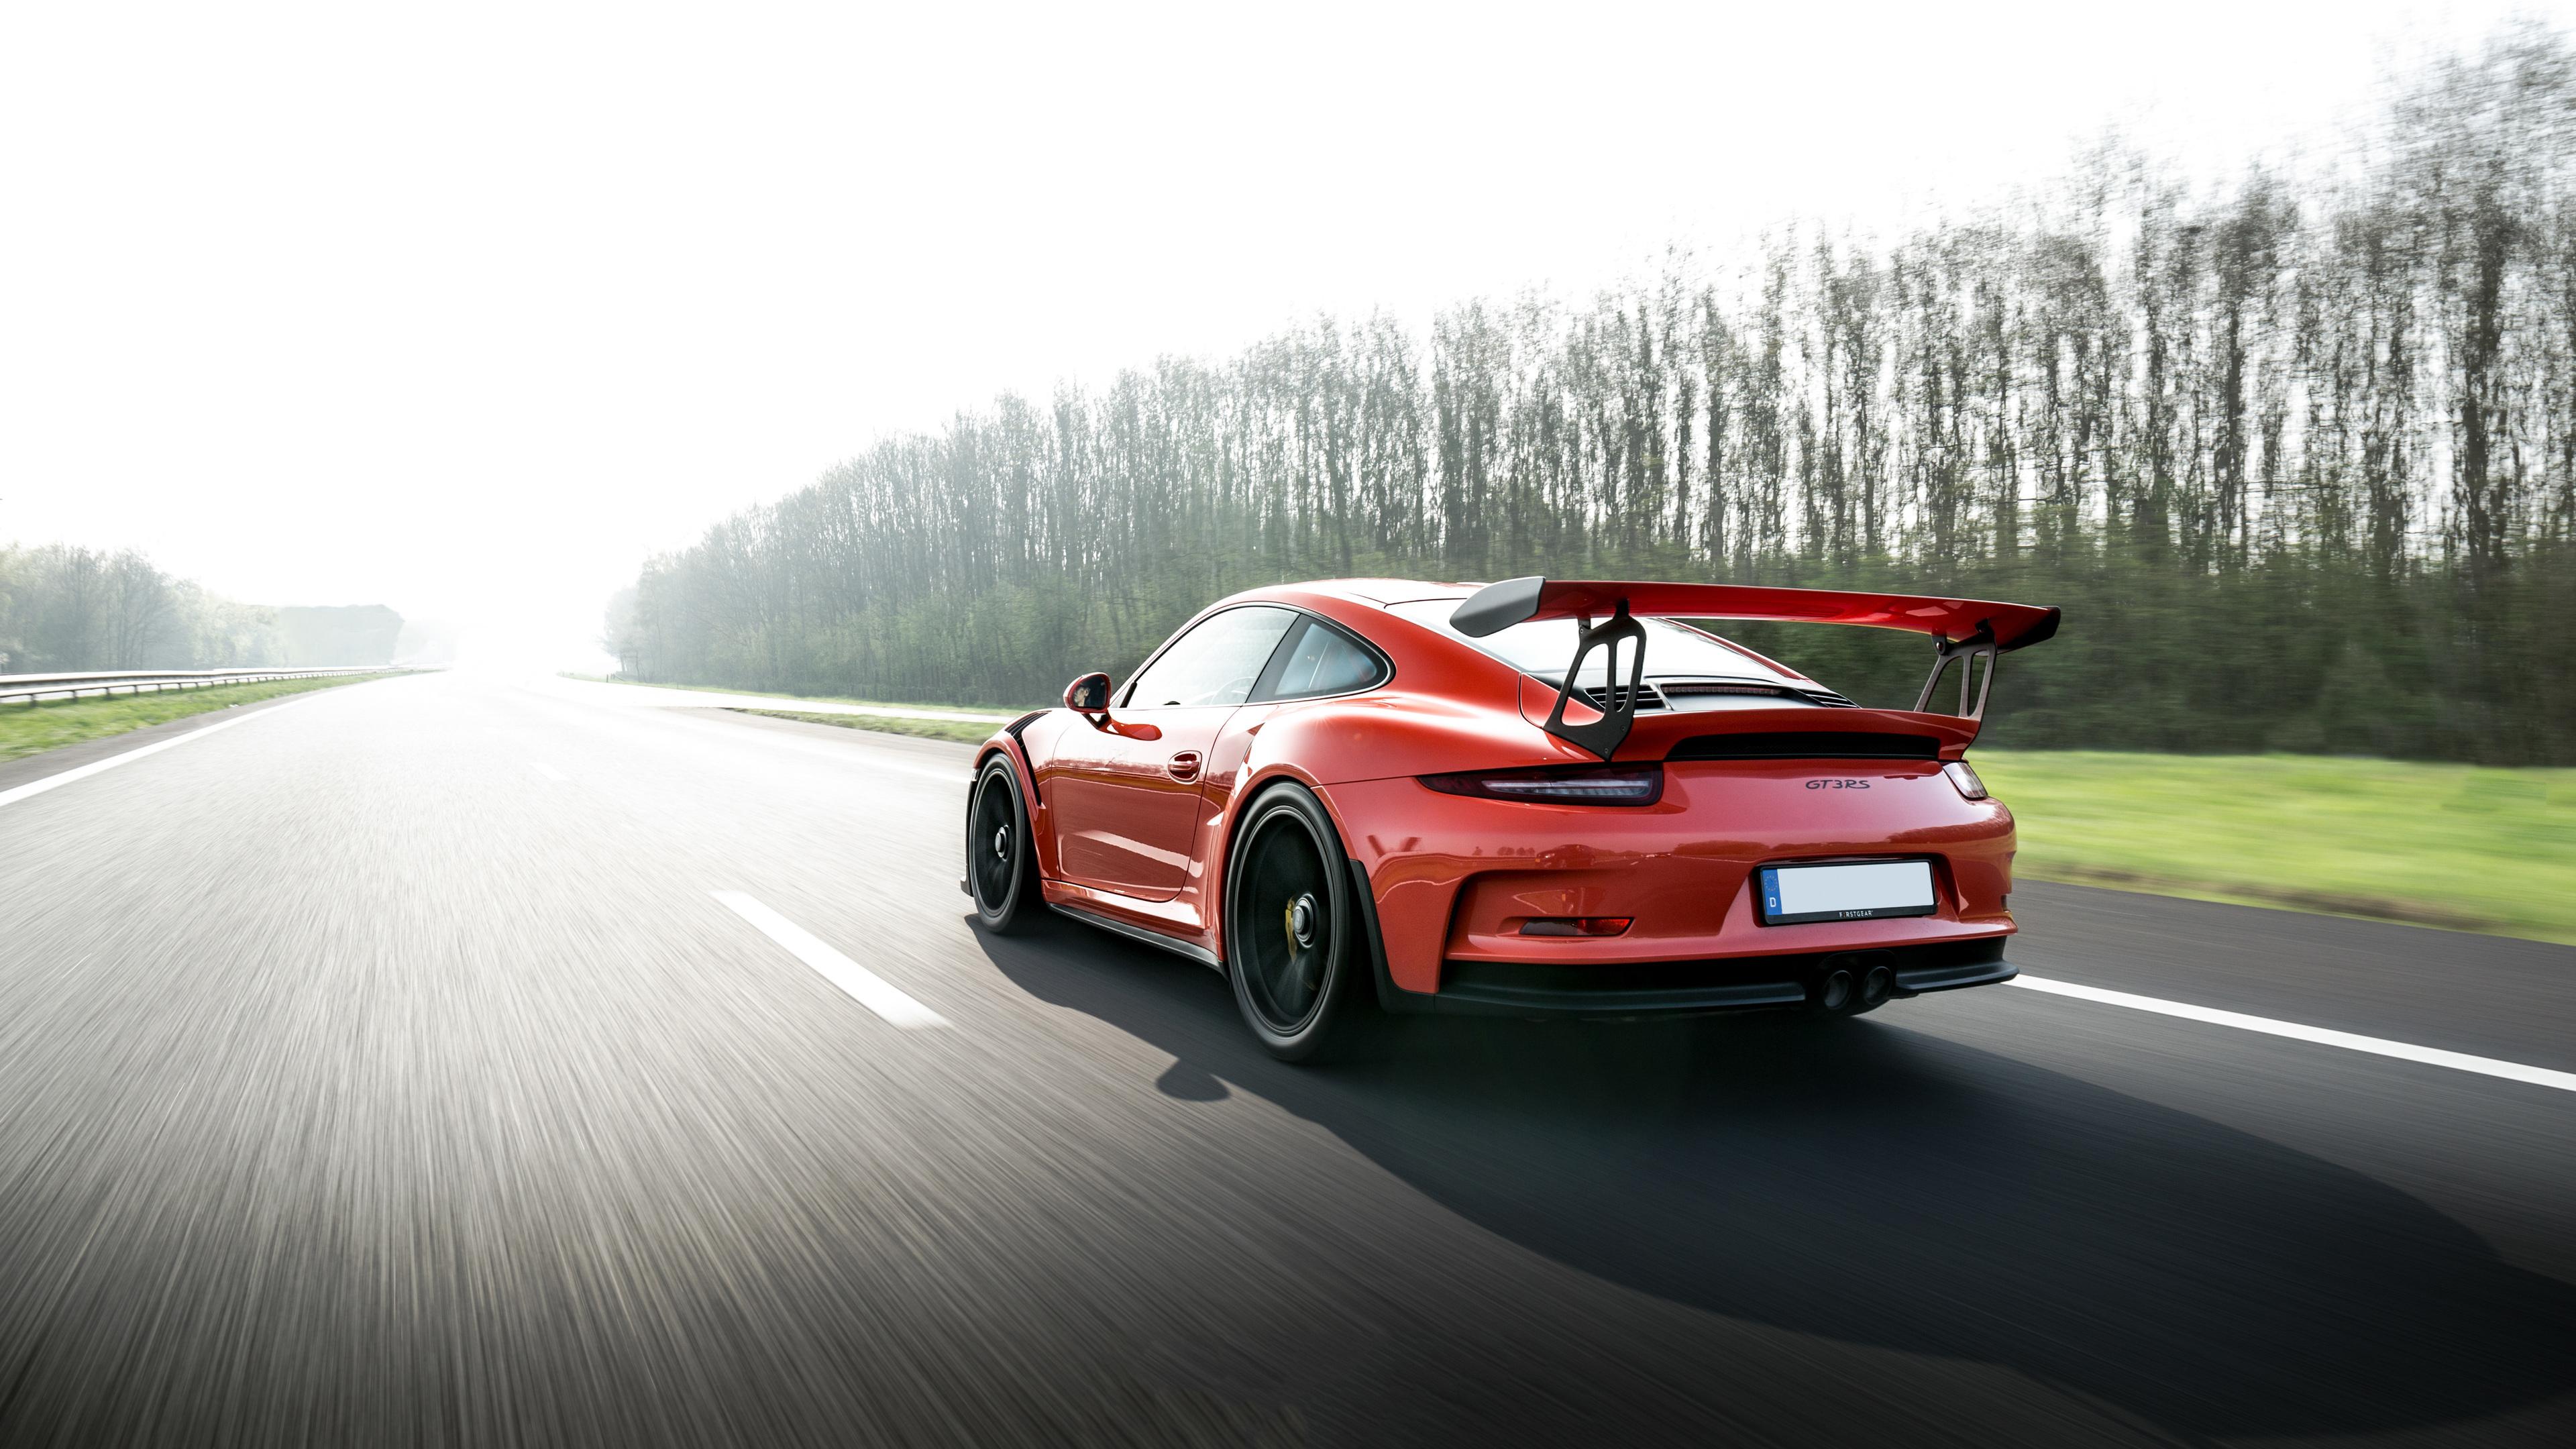 porsche 911 gt3 rs 2018 5k rear 1539113659 - Porsche 911 GT3 RS 2018 5k Rear - porsche wallpapers, porsche 911 wallpapers, porsche 911 gt3 r wallpapers, hd-wallpapers, cars wallpapers, 5k wallpapers, 4k-wallpapers, 2018 cars wallpapers